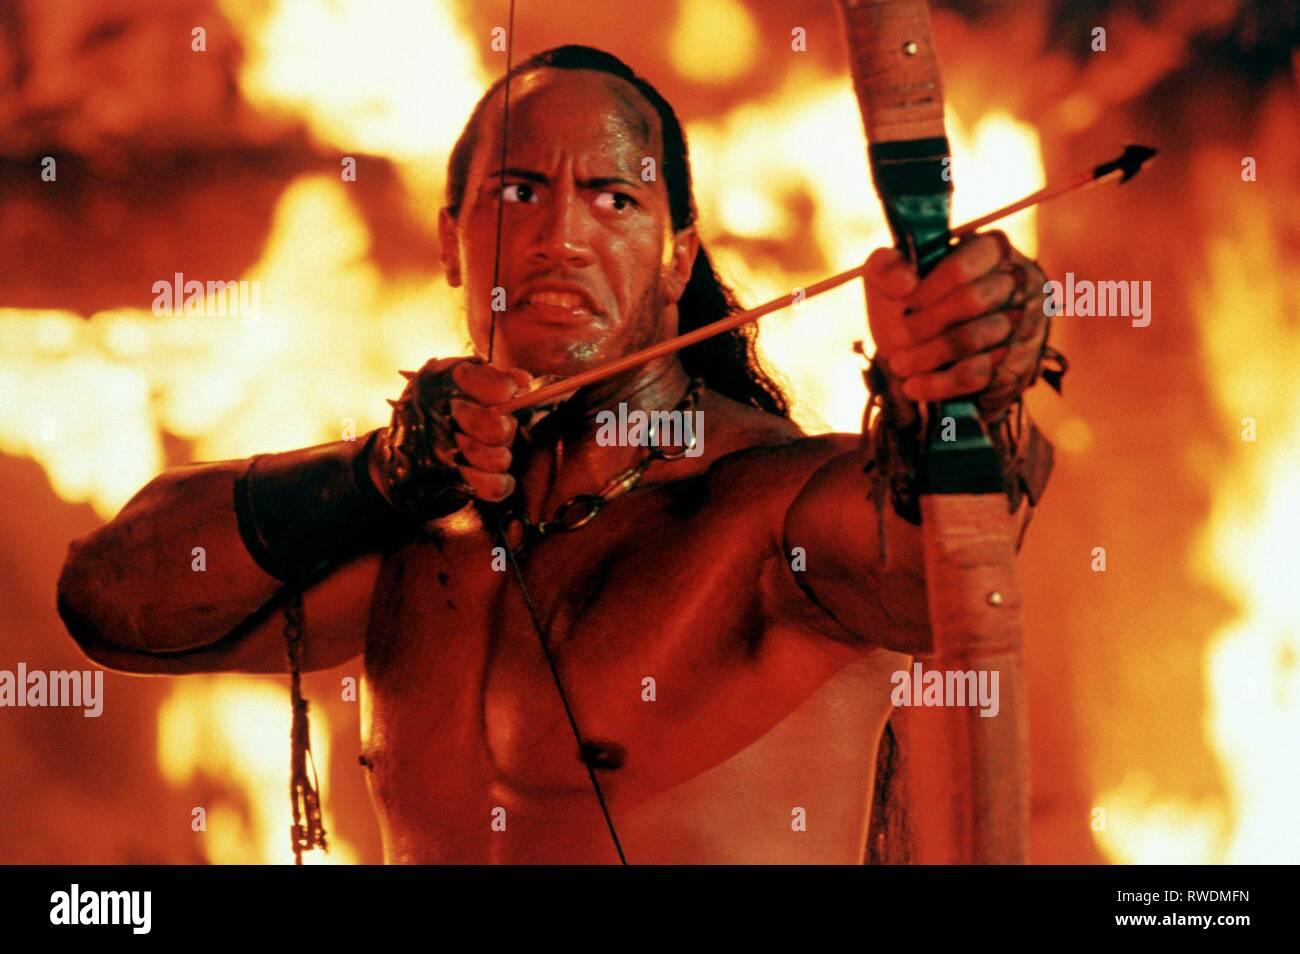 Scorpion King Stock Photos & Scorpion King Stock Images - Alamy